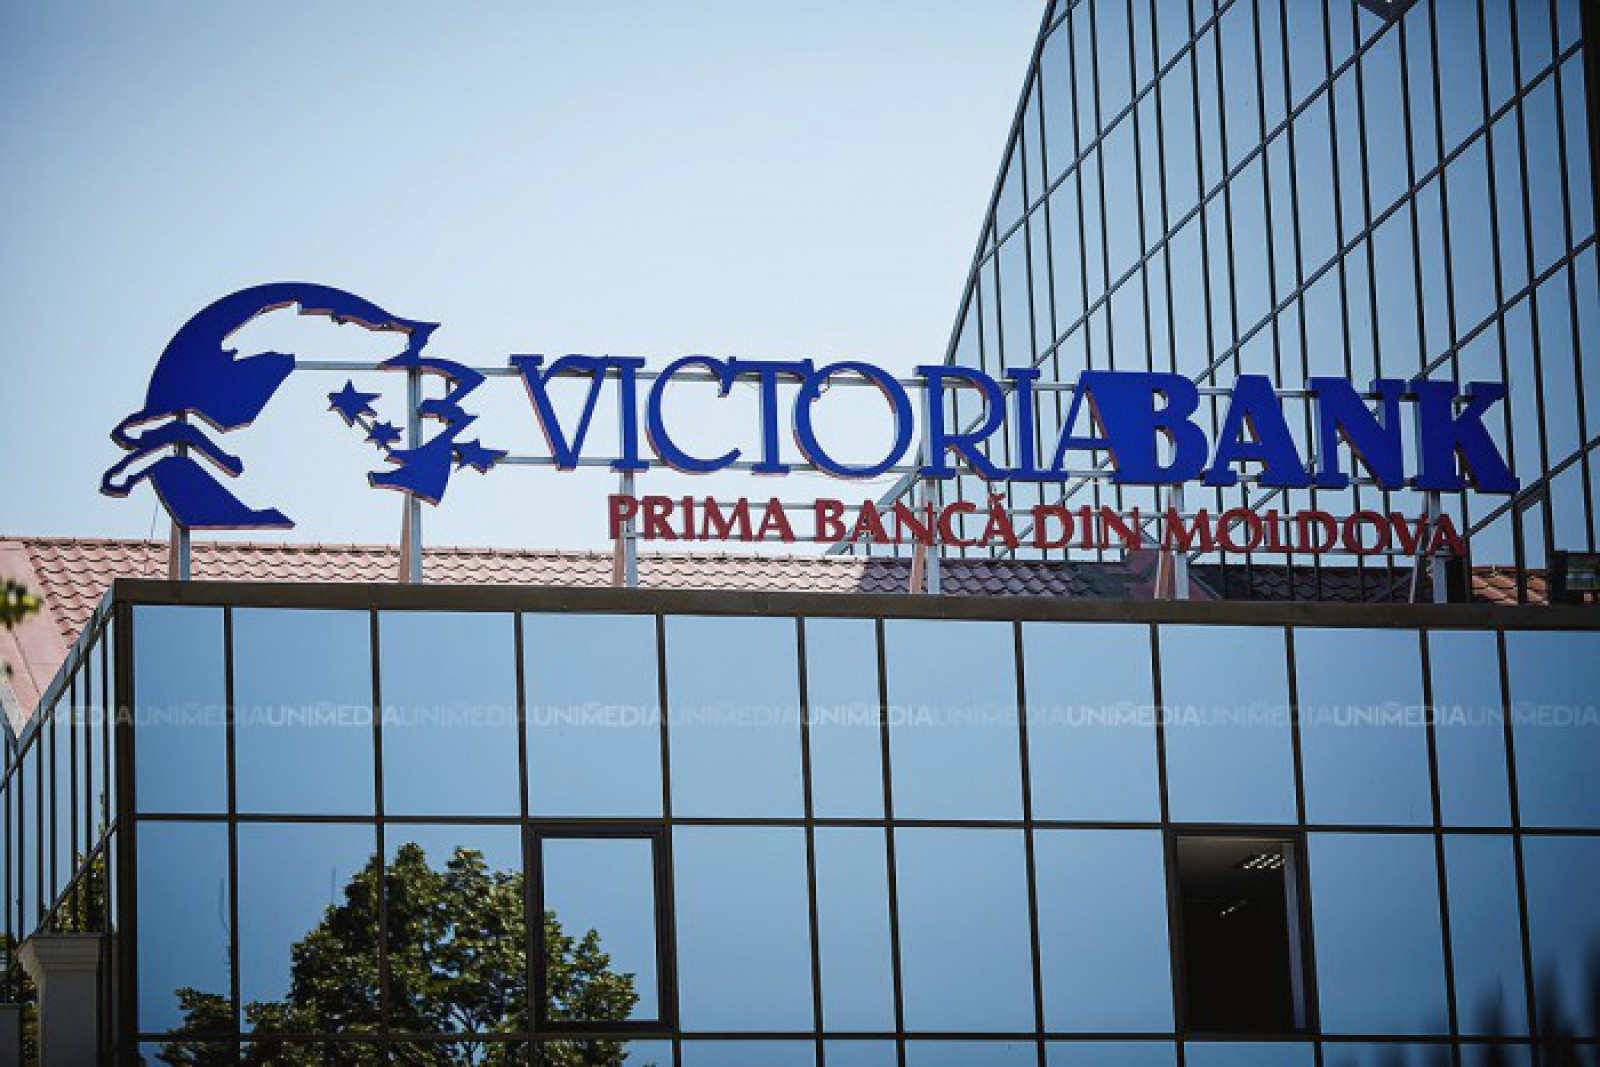 Mold-street. Record la Bursa de Valori a Moldovei: Au fost vândute acțiunile Victoriabank